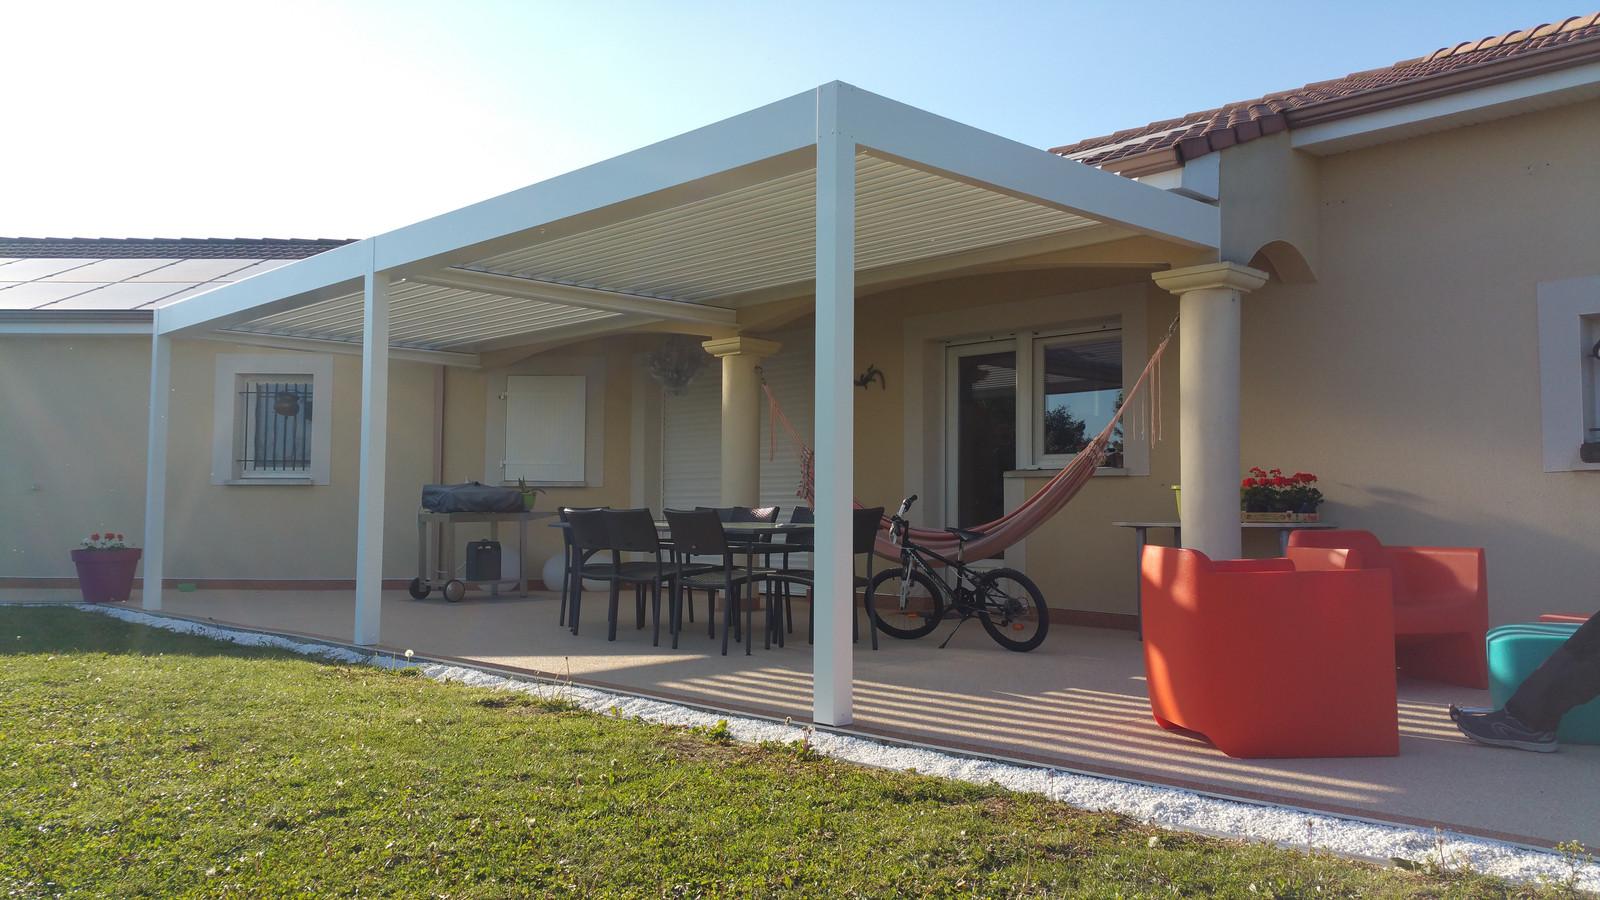 pergola bioclimatique solembra so 39 by solembra. Black Bedroom Furniture Sets. Home Design Ideas